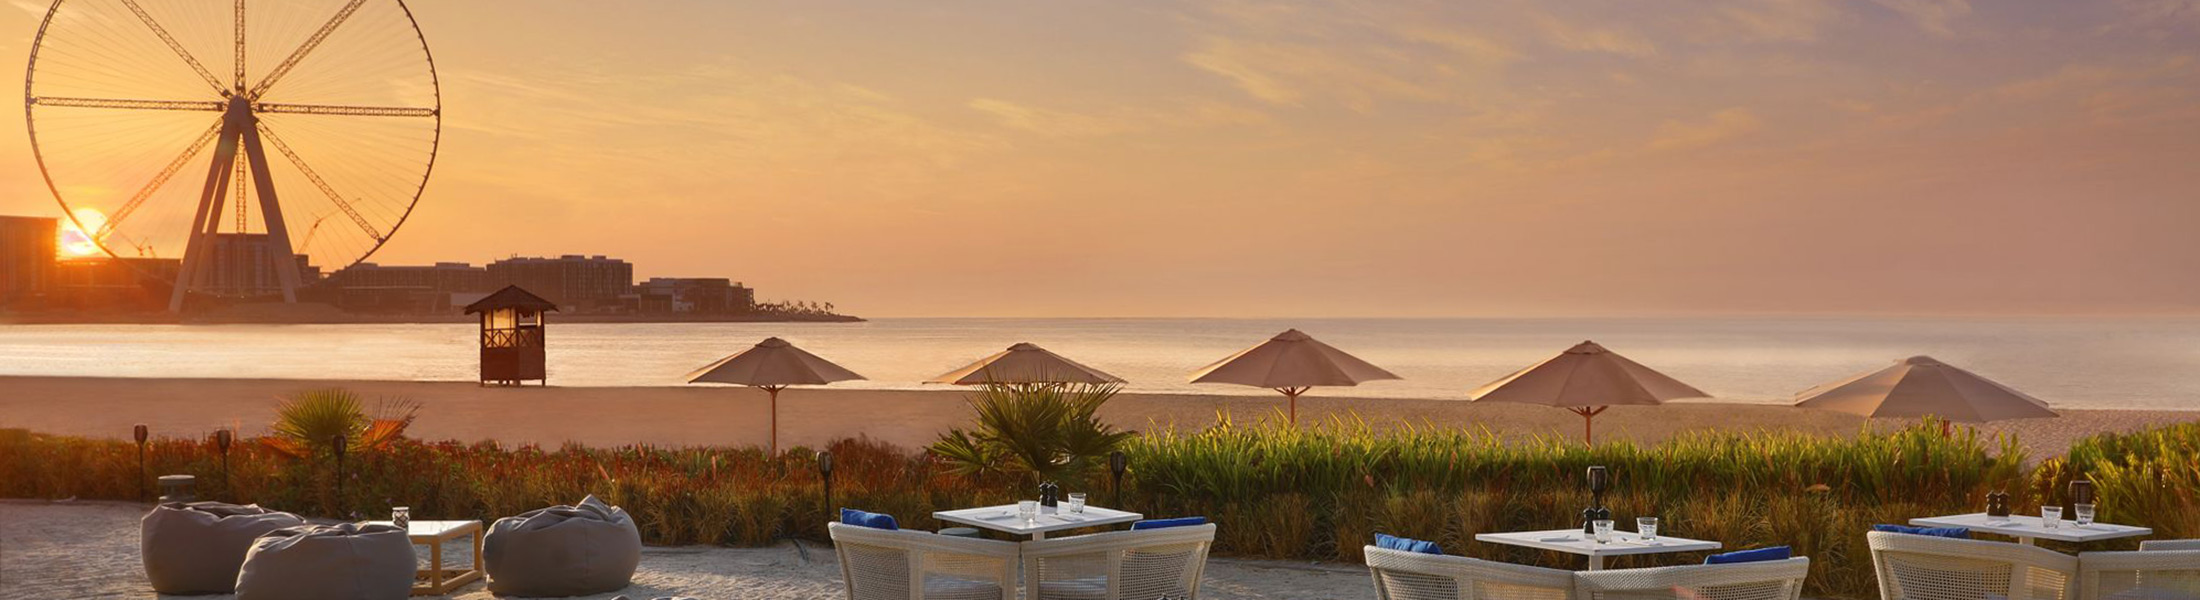 Outdoor dining at sunset at Ritz-Carlton Dubai